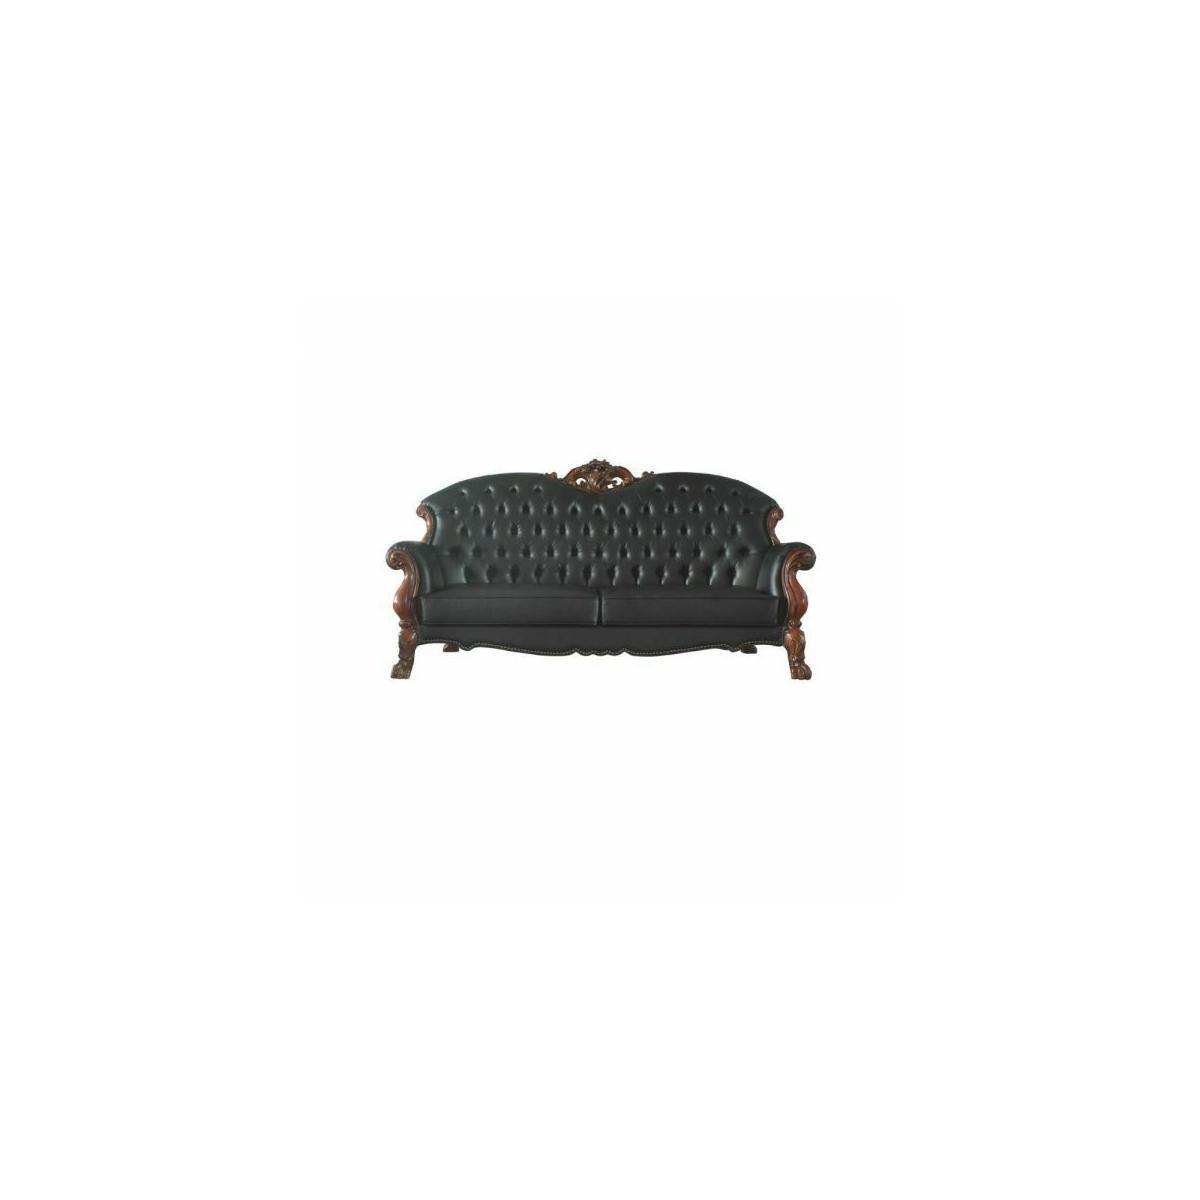 ACME Dresden Sofa w/5 Pillows - 58230 - Traditional, Vintage - PU, Frame: Wood (Poplar, Ply), Poly-Resin (Fiberglass) - Cherry Oak and PU